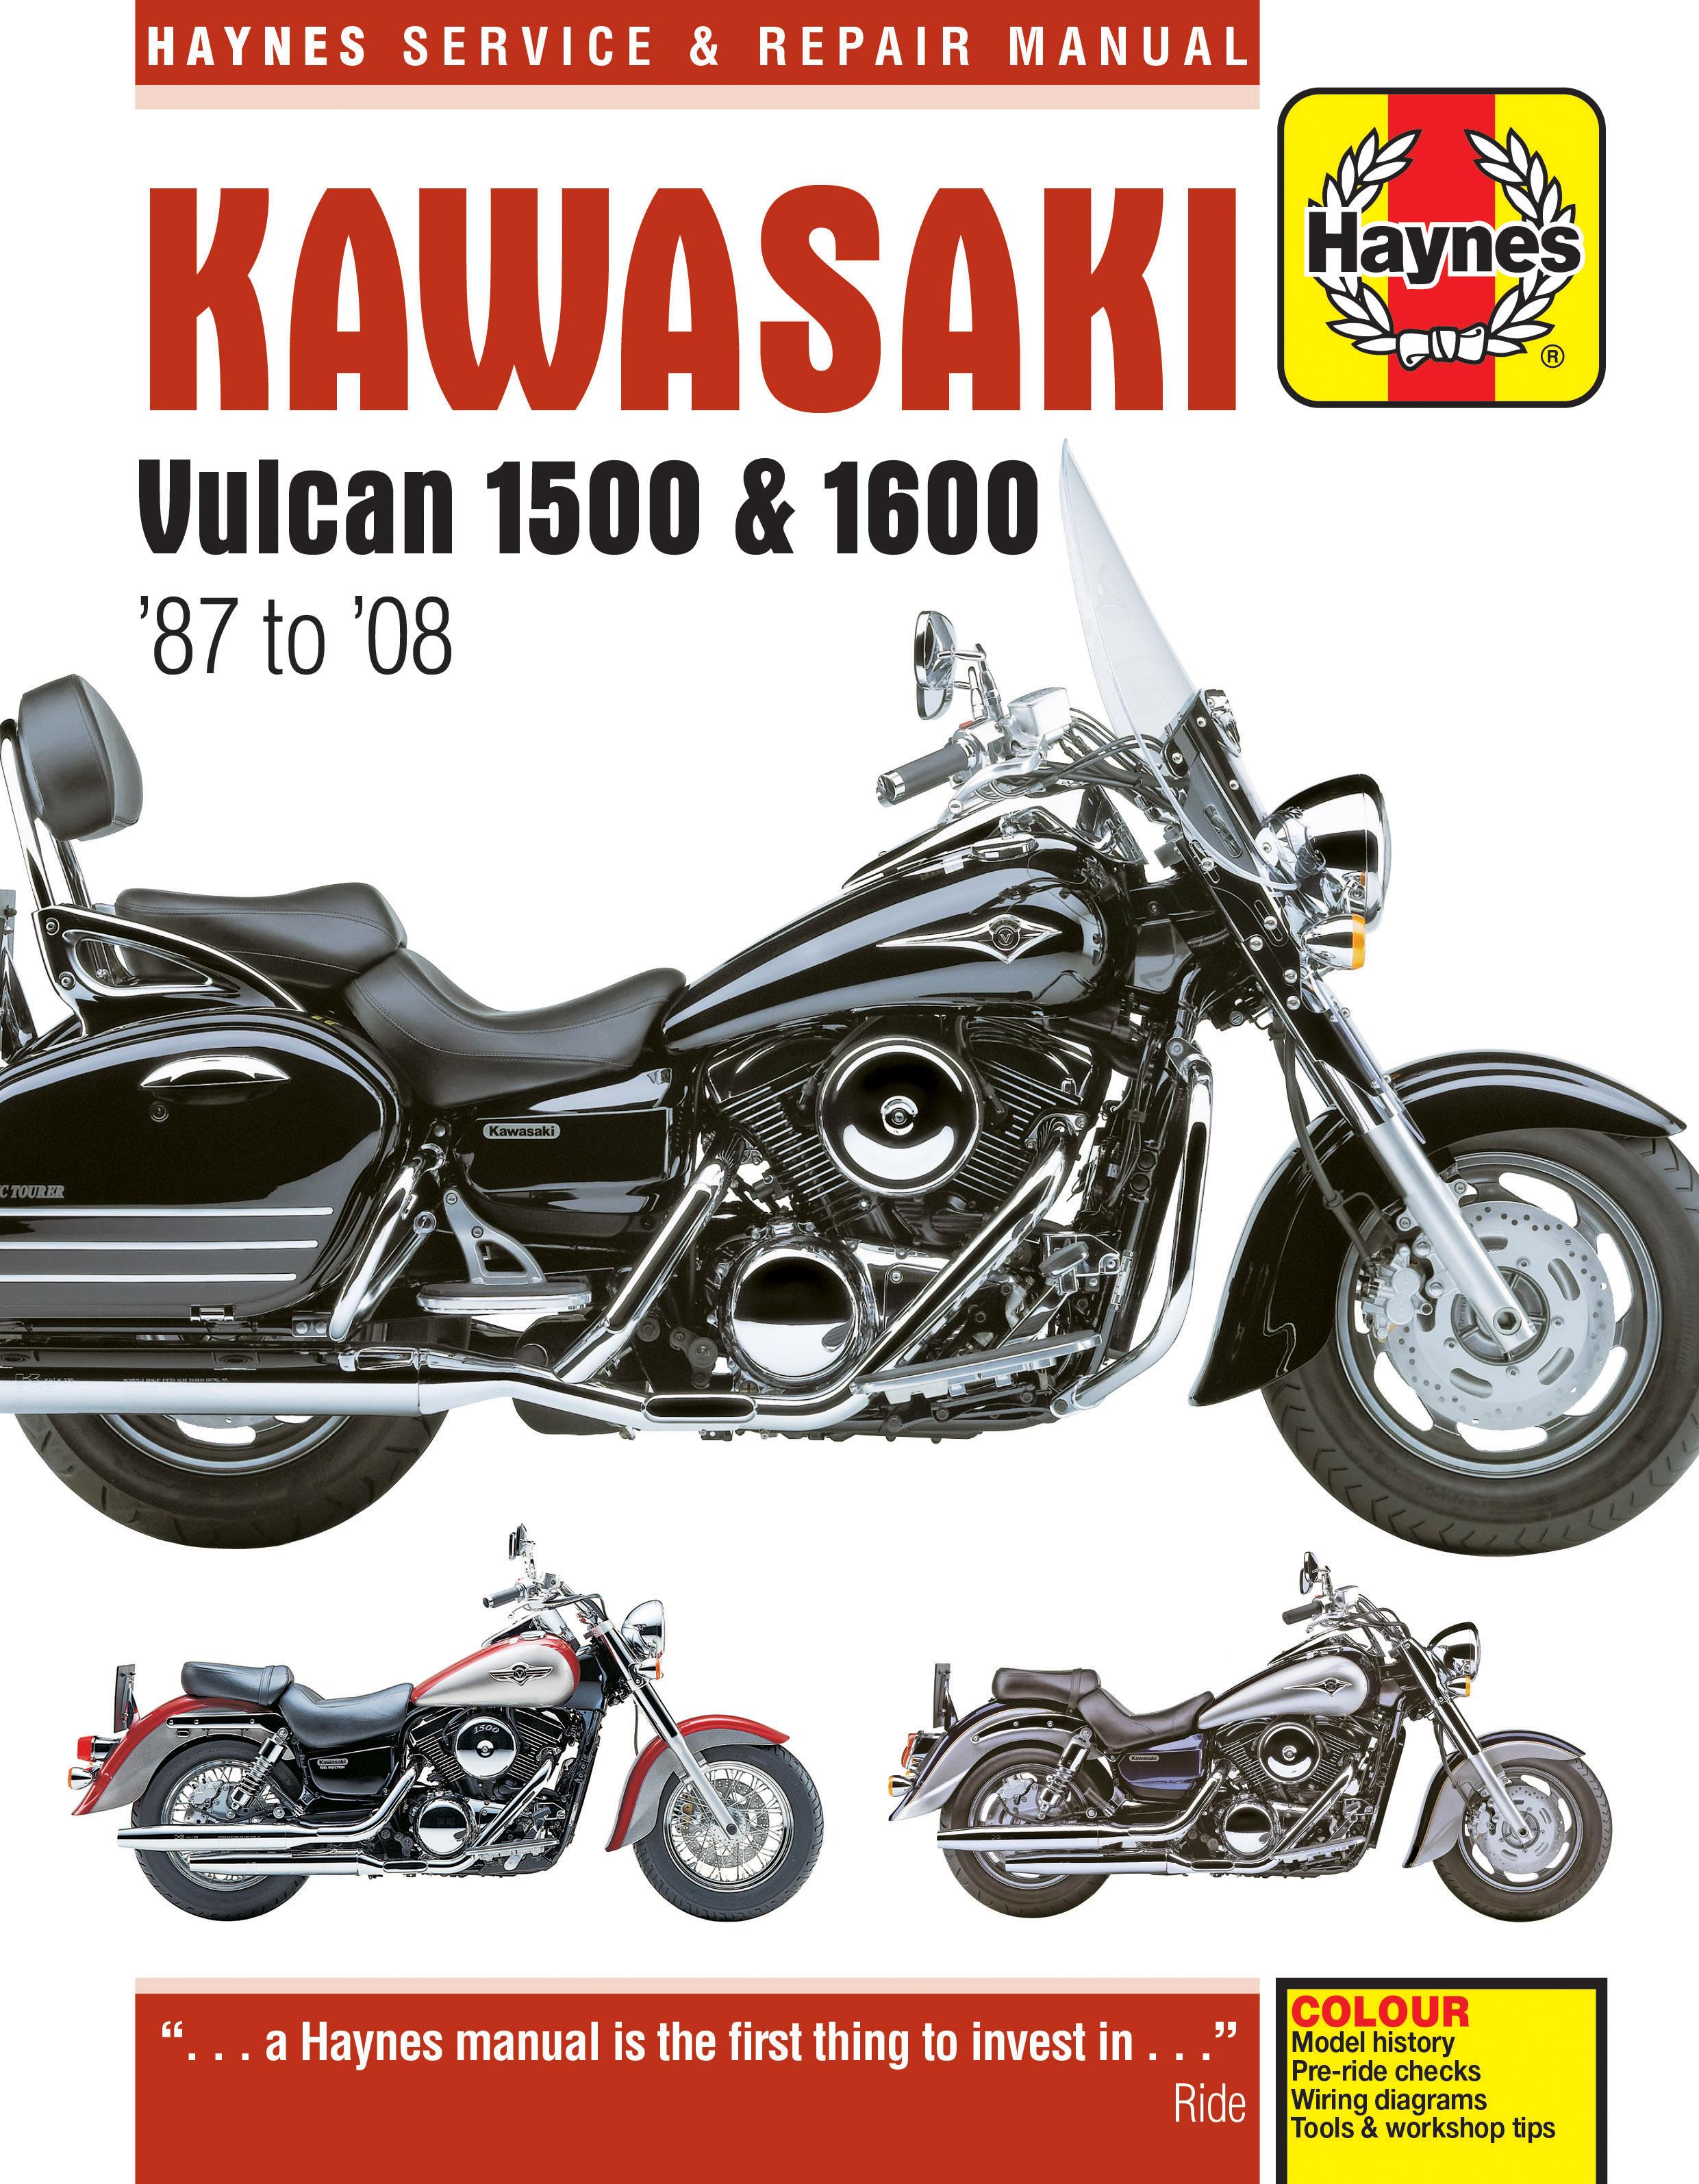 kawasaki vulcan 1500 1600 87 08 haynes repair manual haynes rh haynes com